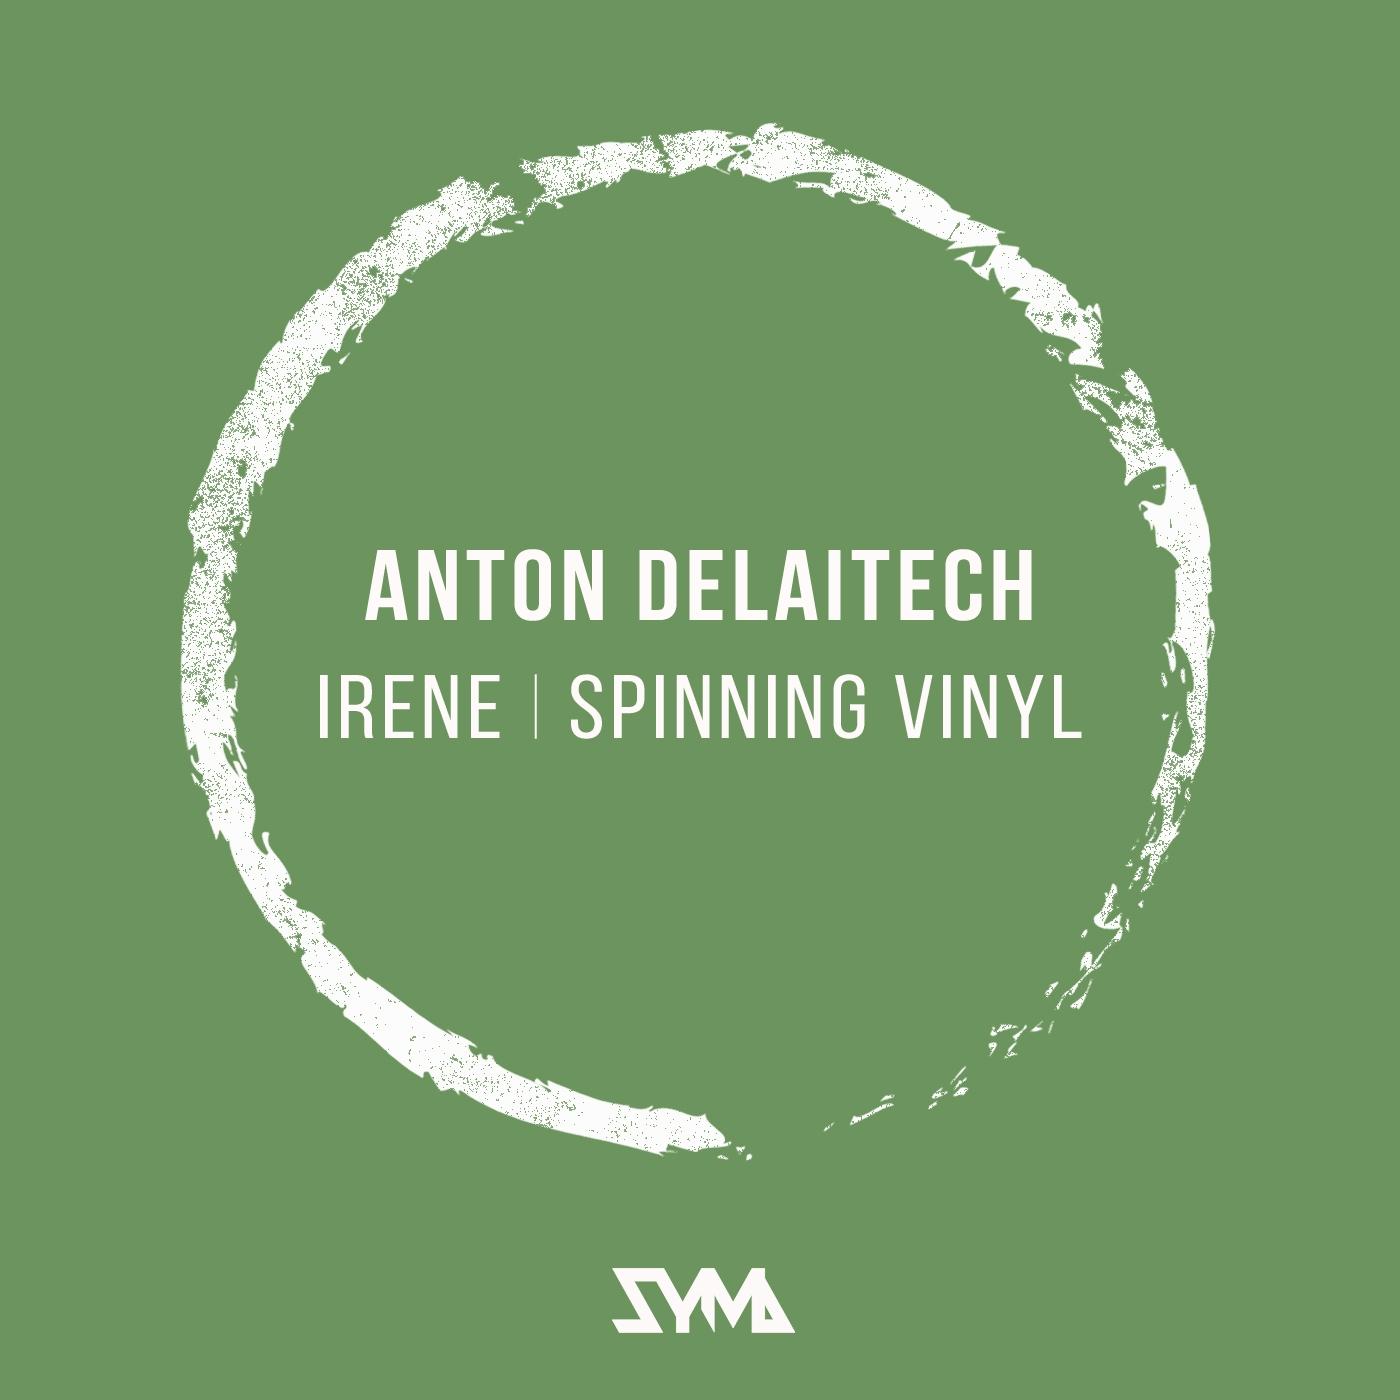 Anton DelaiTech - Spinning Vinyl (Original mix)